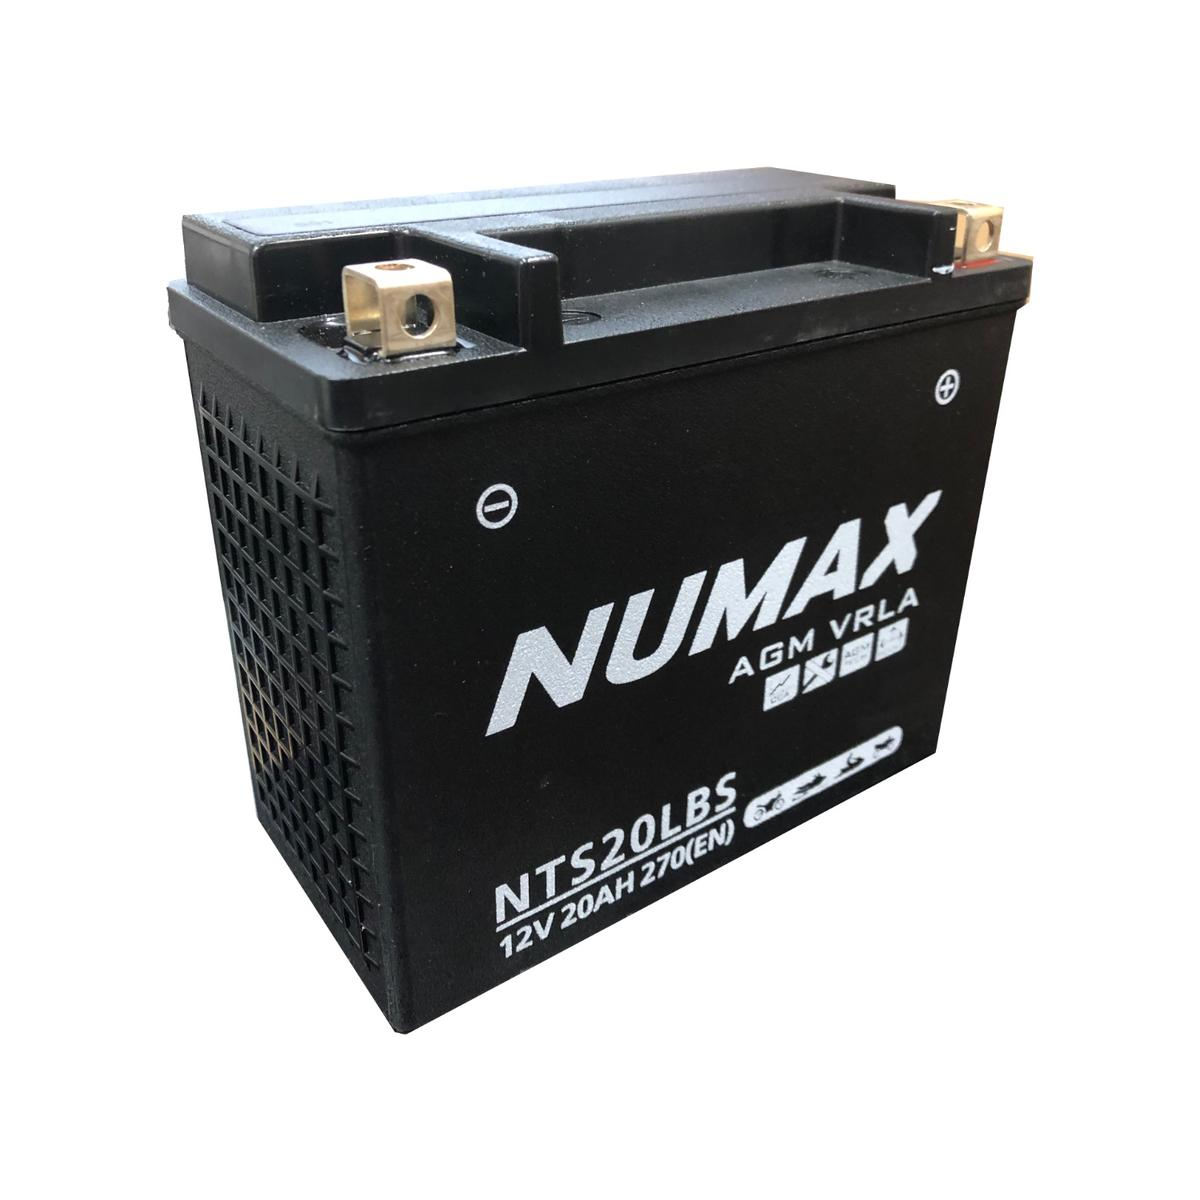 Numax NTS20LBS Harley Davidson FXST Softail Badboy Battery